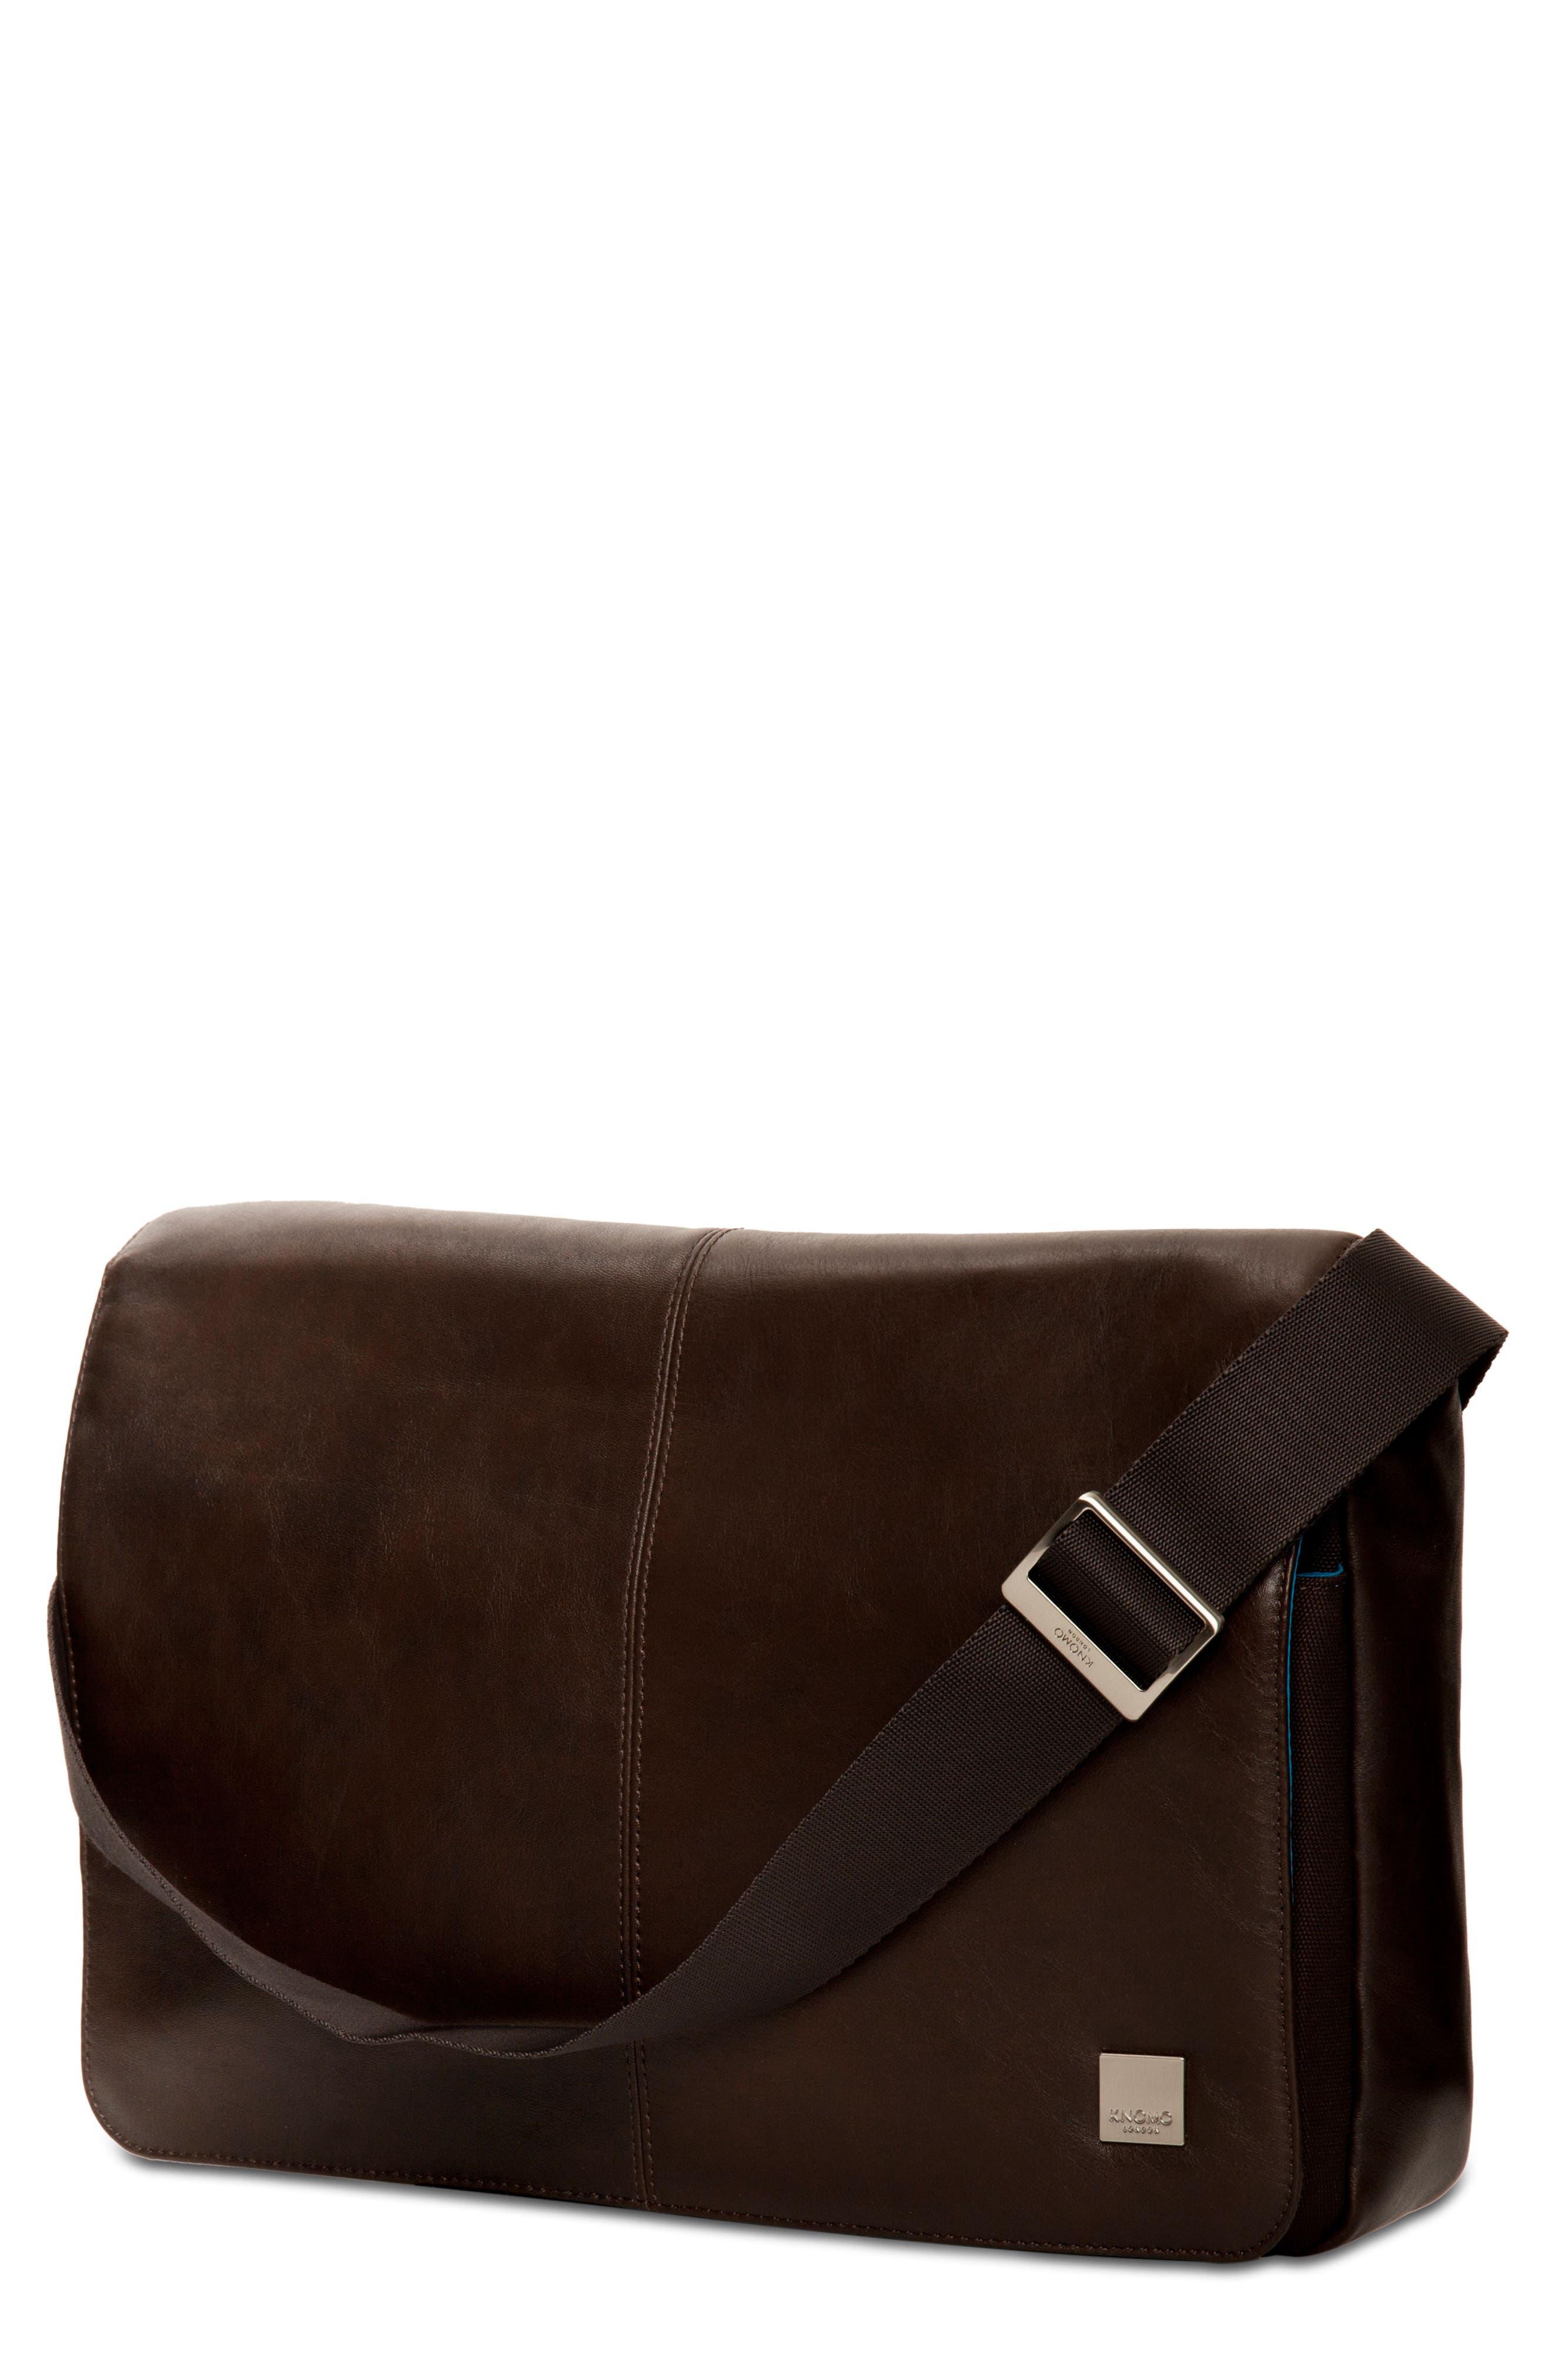 Main Image - KNOMO London Brompton Kinsale RFID Leather Messenger Bag